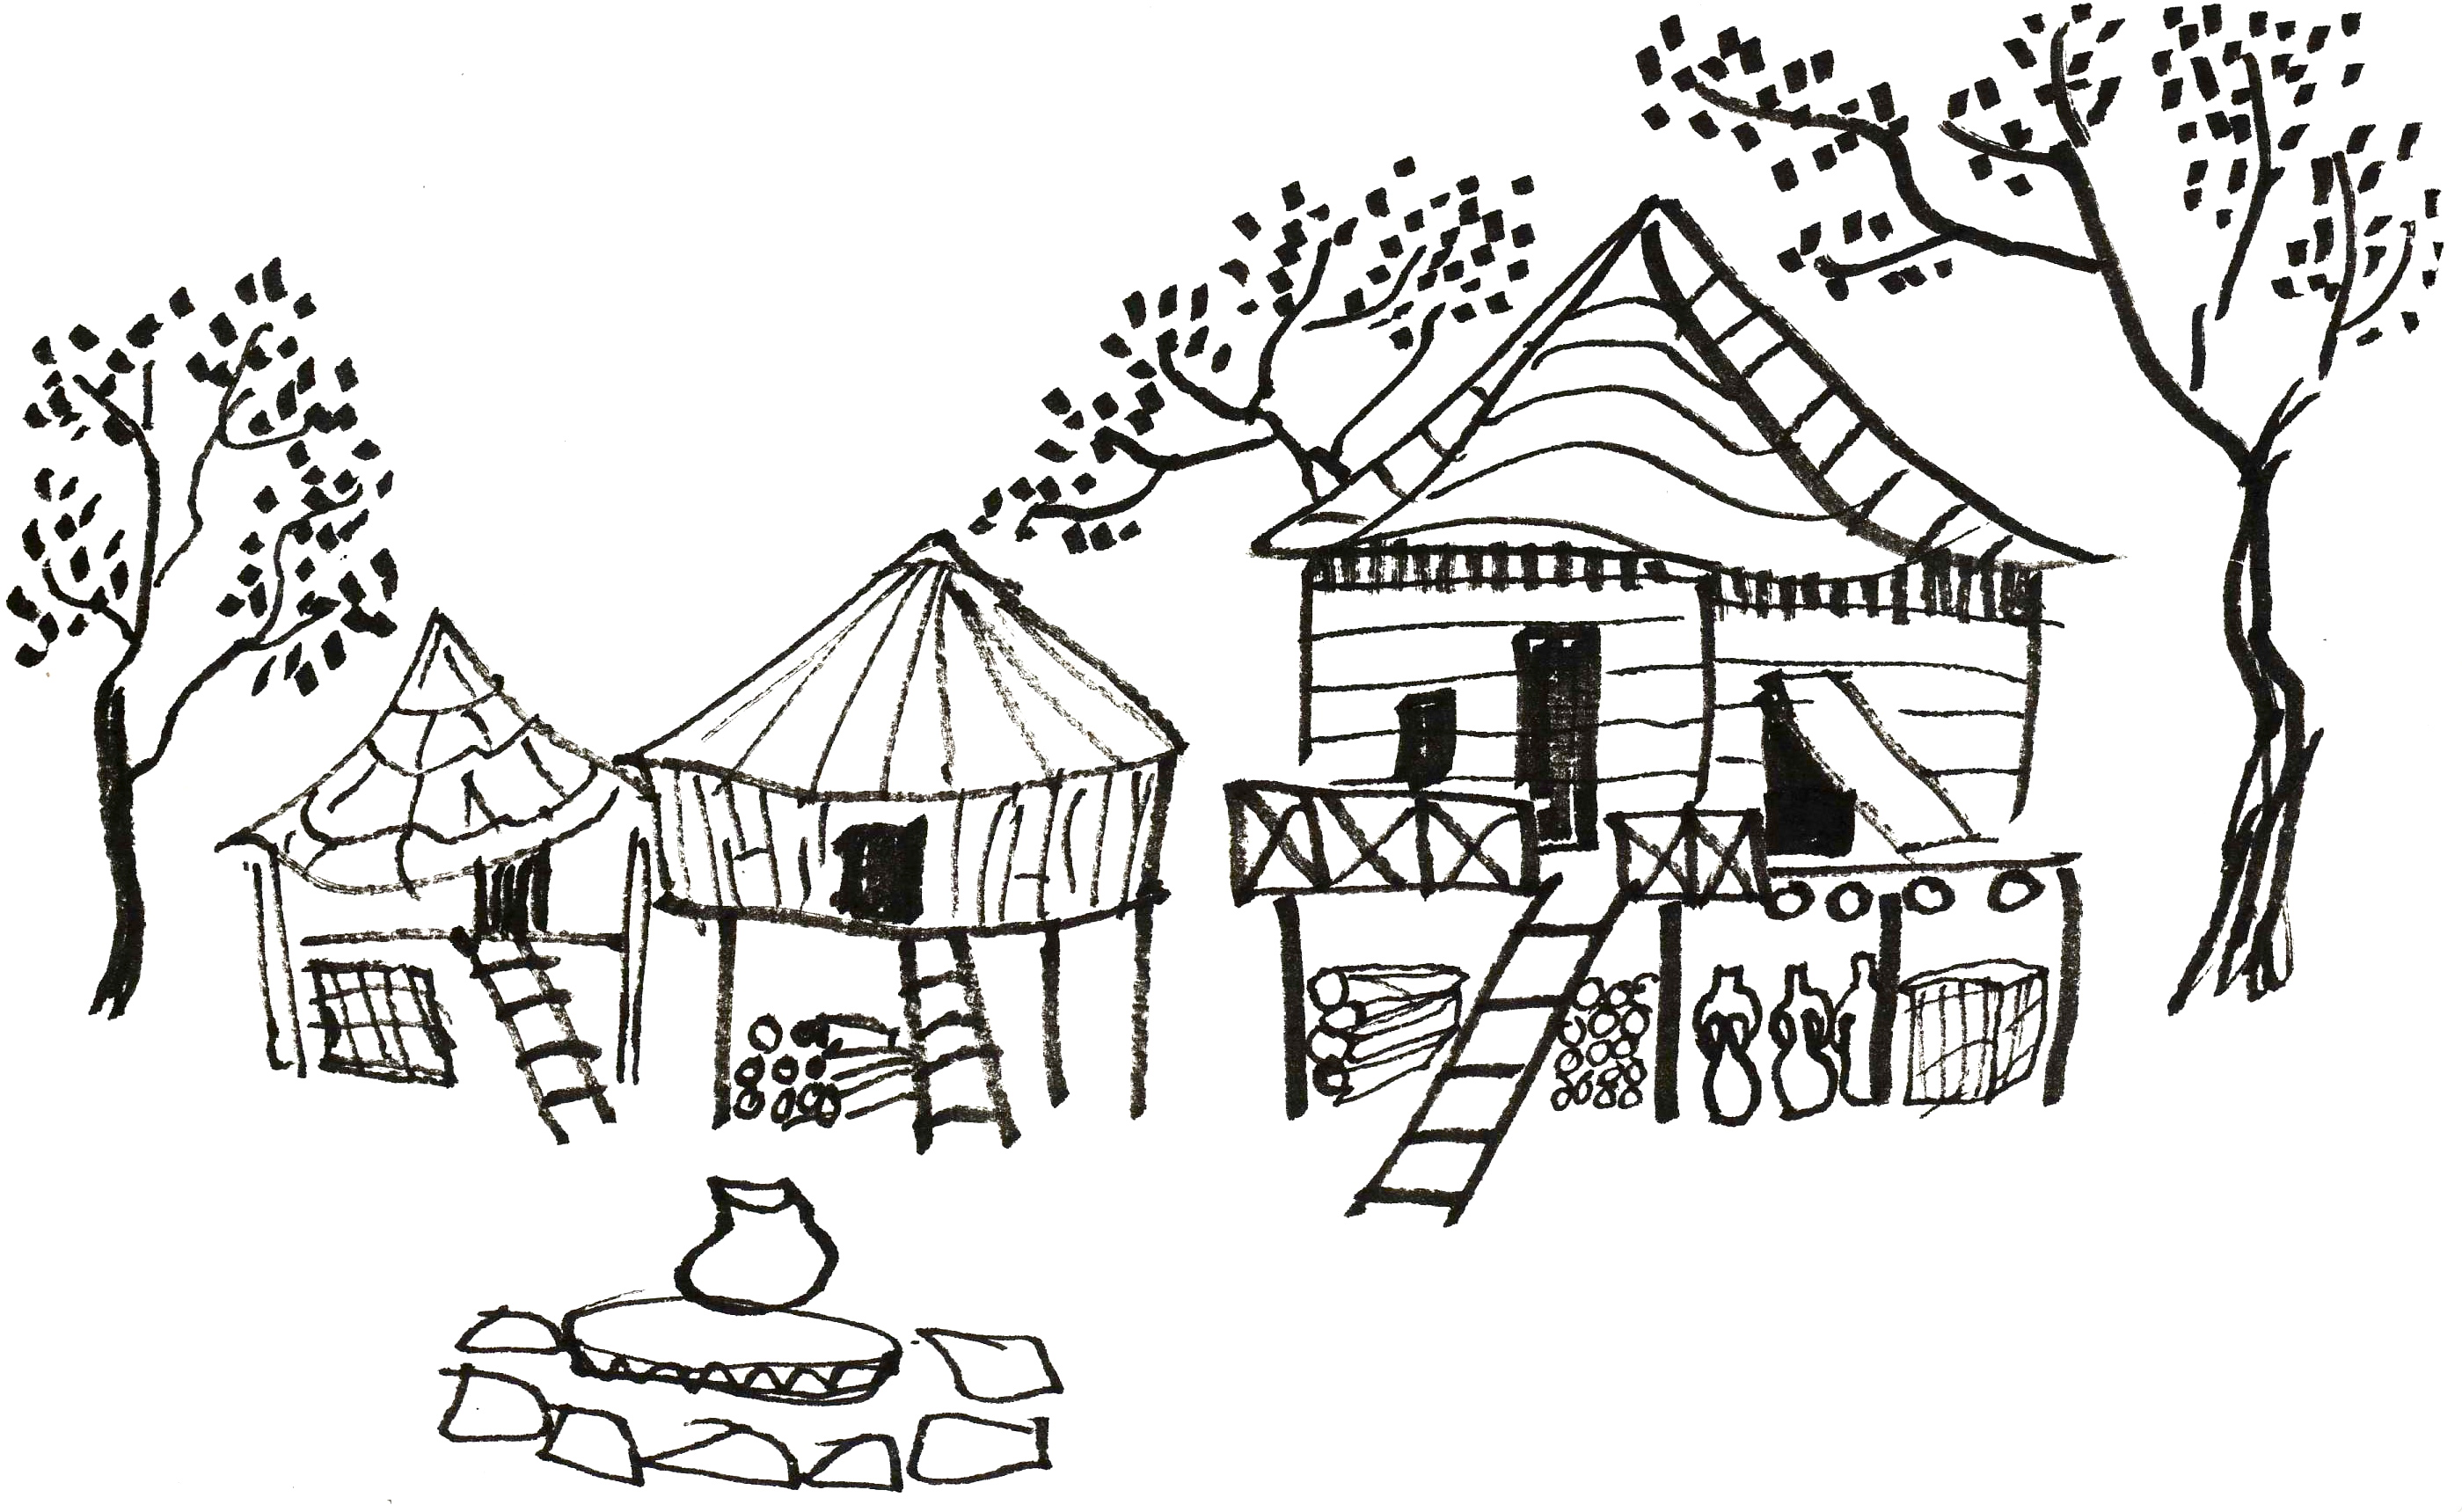 Kehyo's drawing of Ilnai